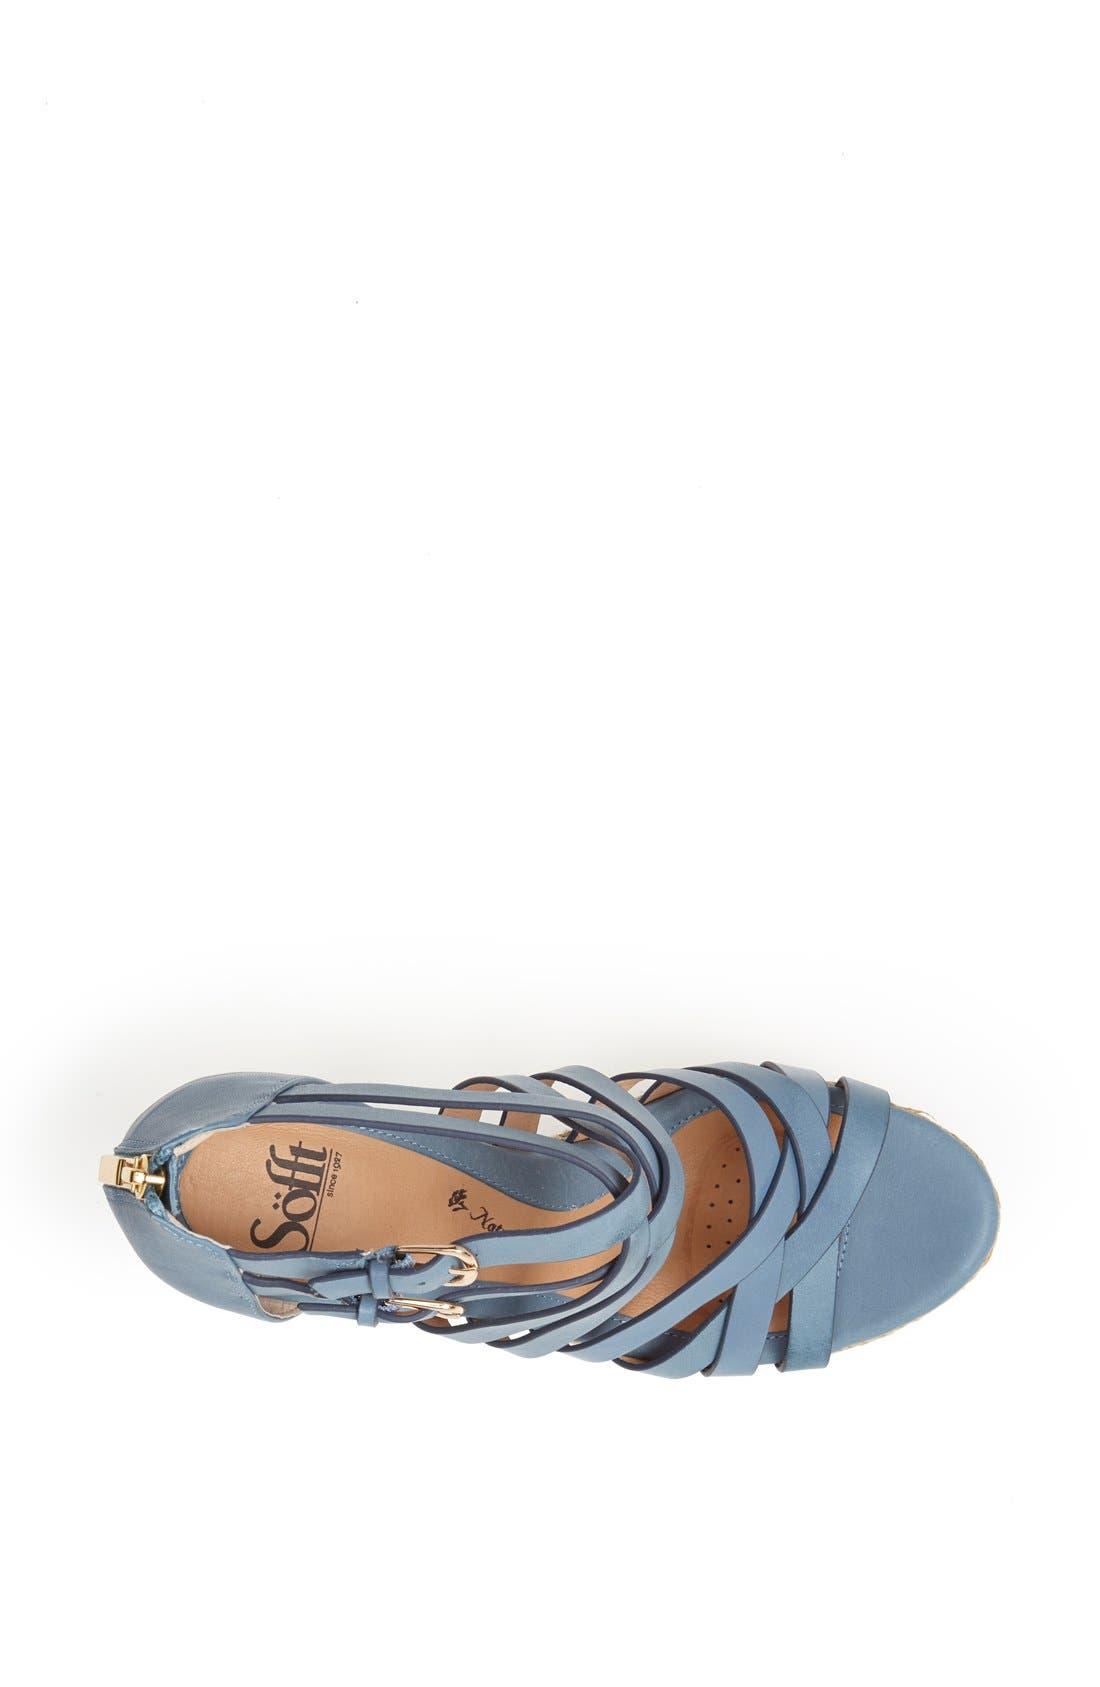 Alternate Image 3  - Söfft 'Priti' Wedge Sandal